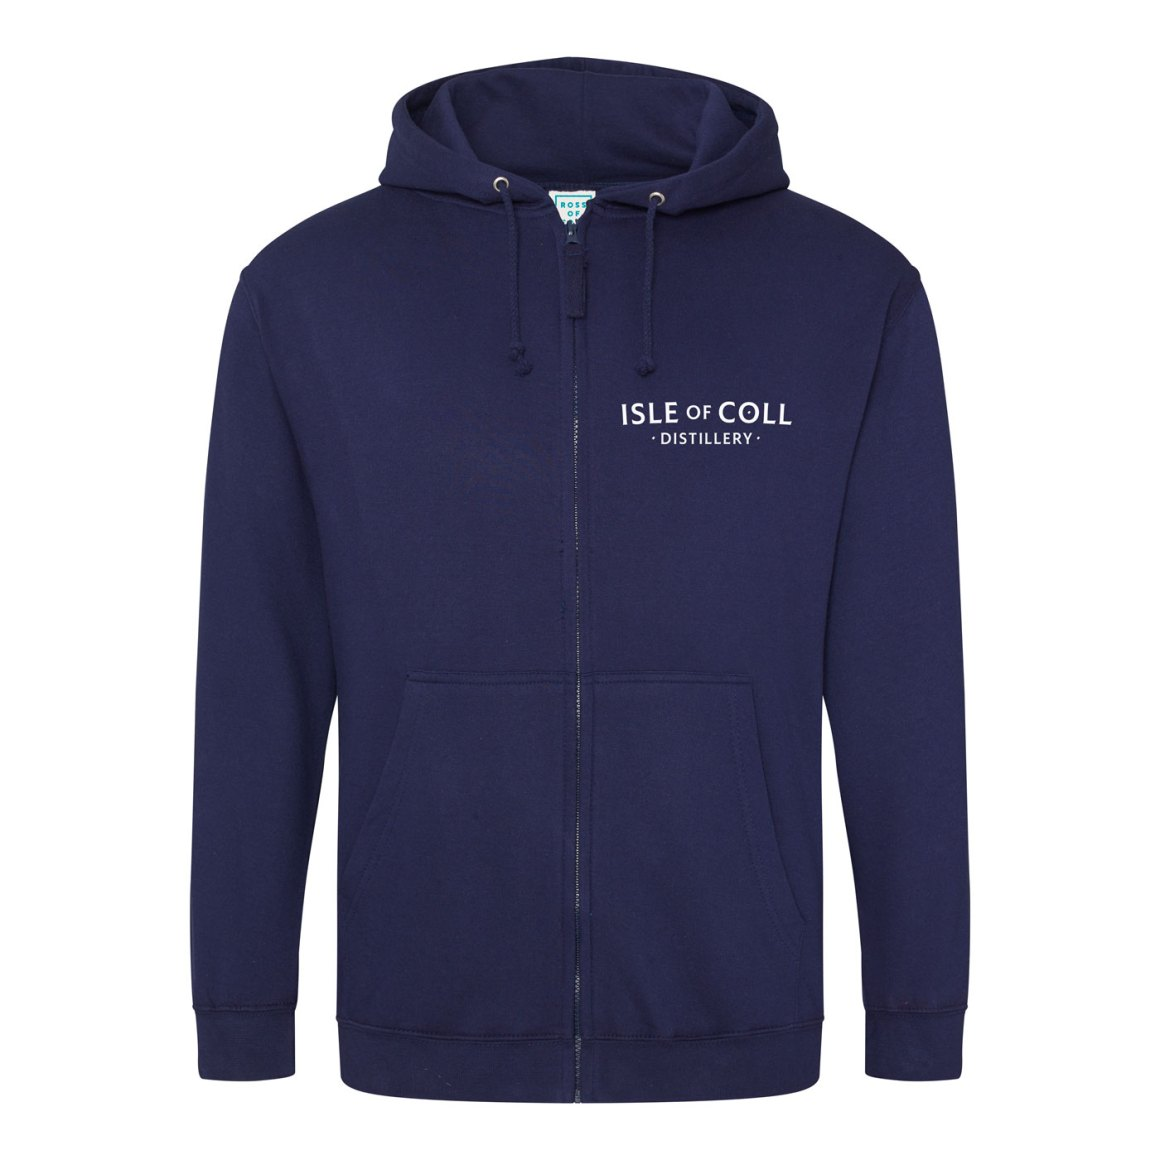 Isle of Coll Distillery Zipped Hoodie